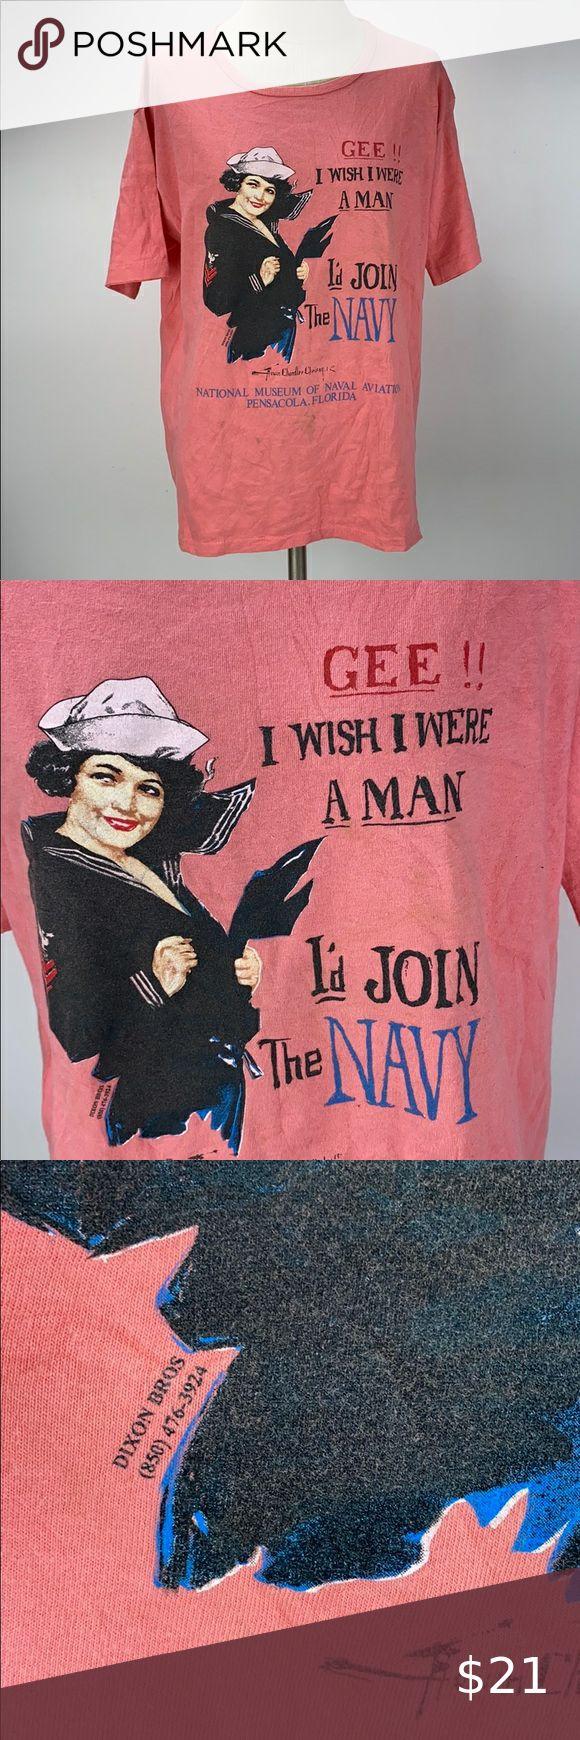 Vintage Navy TShirt Size Large in 2020 Navy tshirt